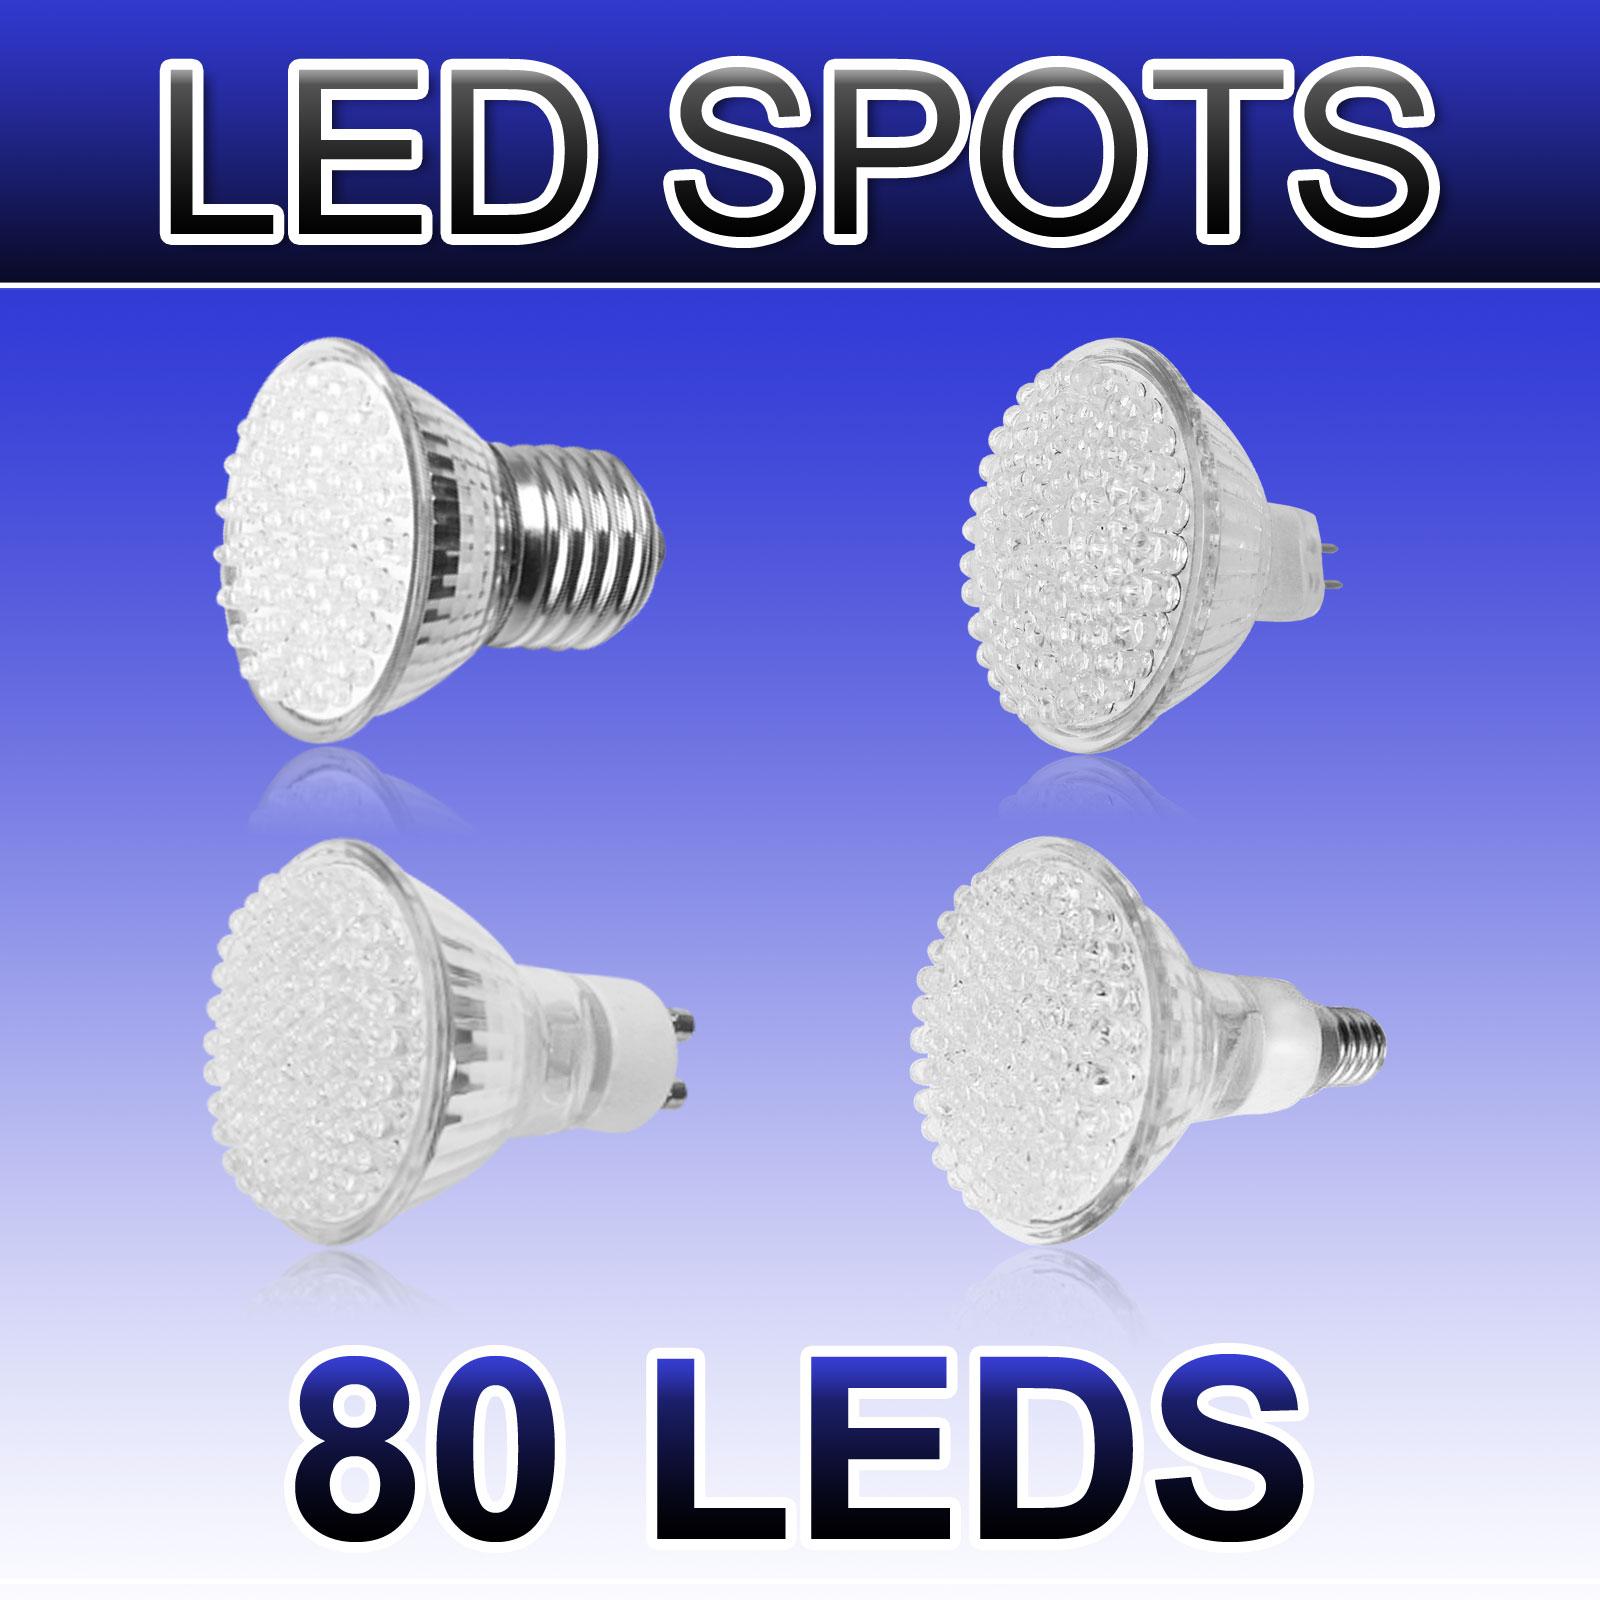 EAXUS-Strahler-mit-80-LED-Dioden-warmweiss-hellweiss-NEU